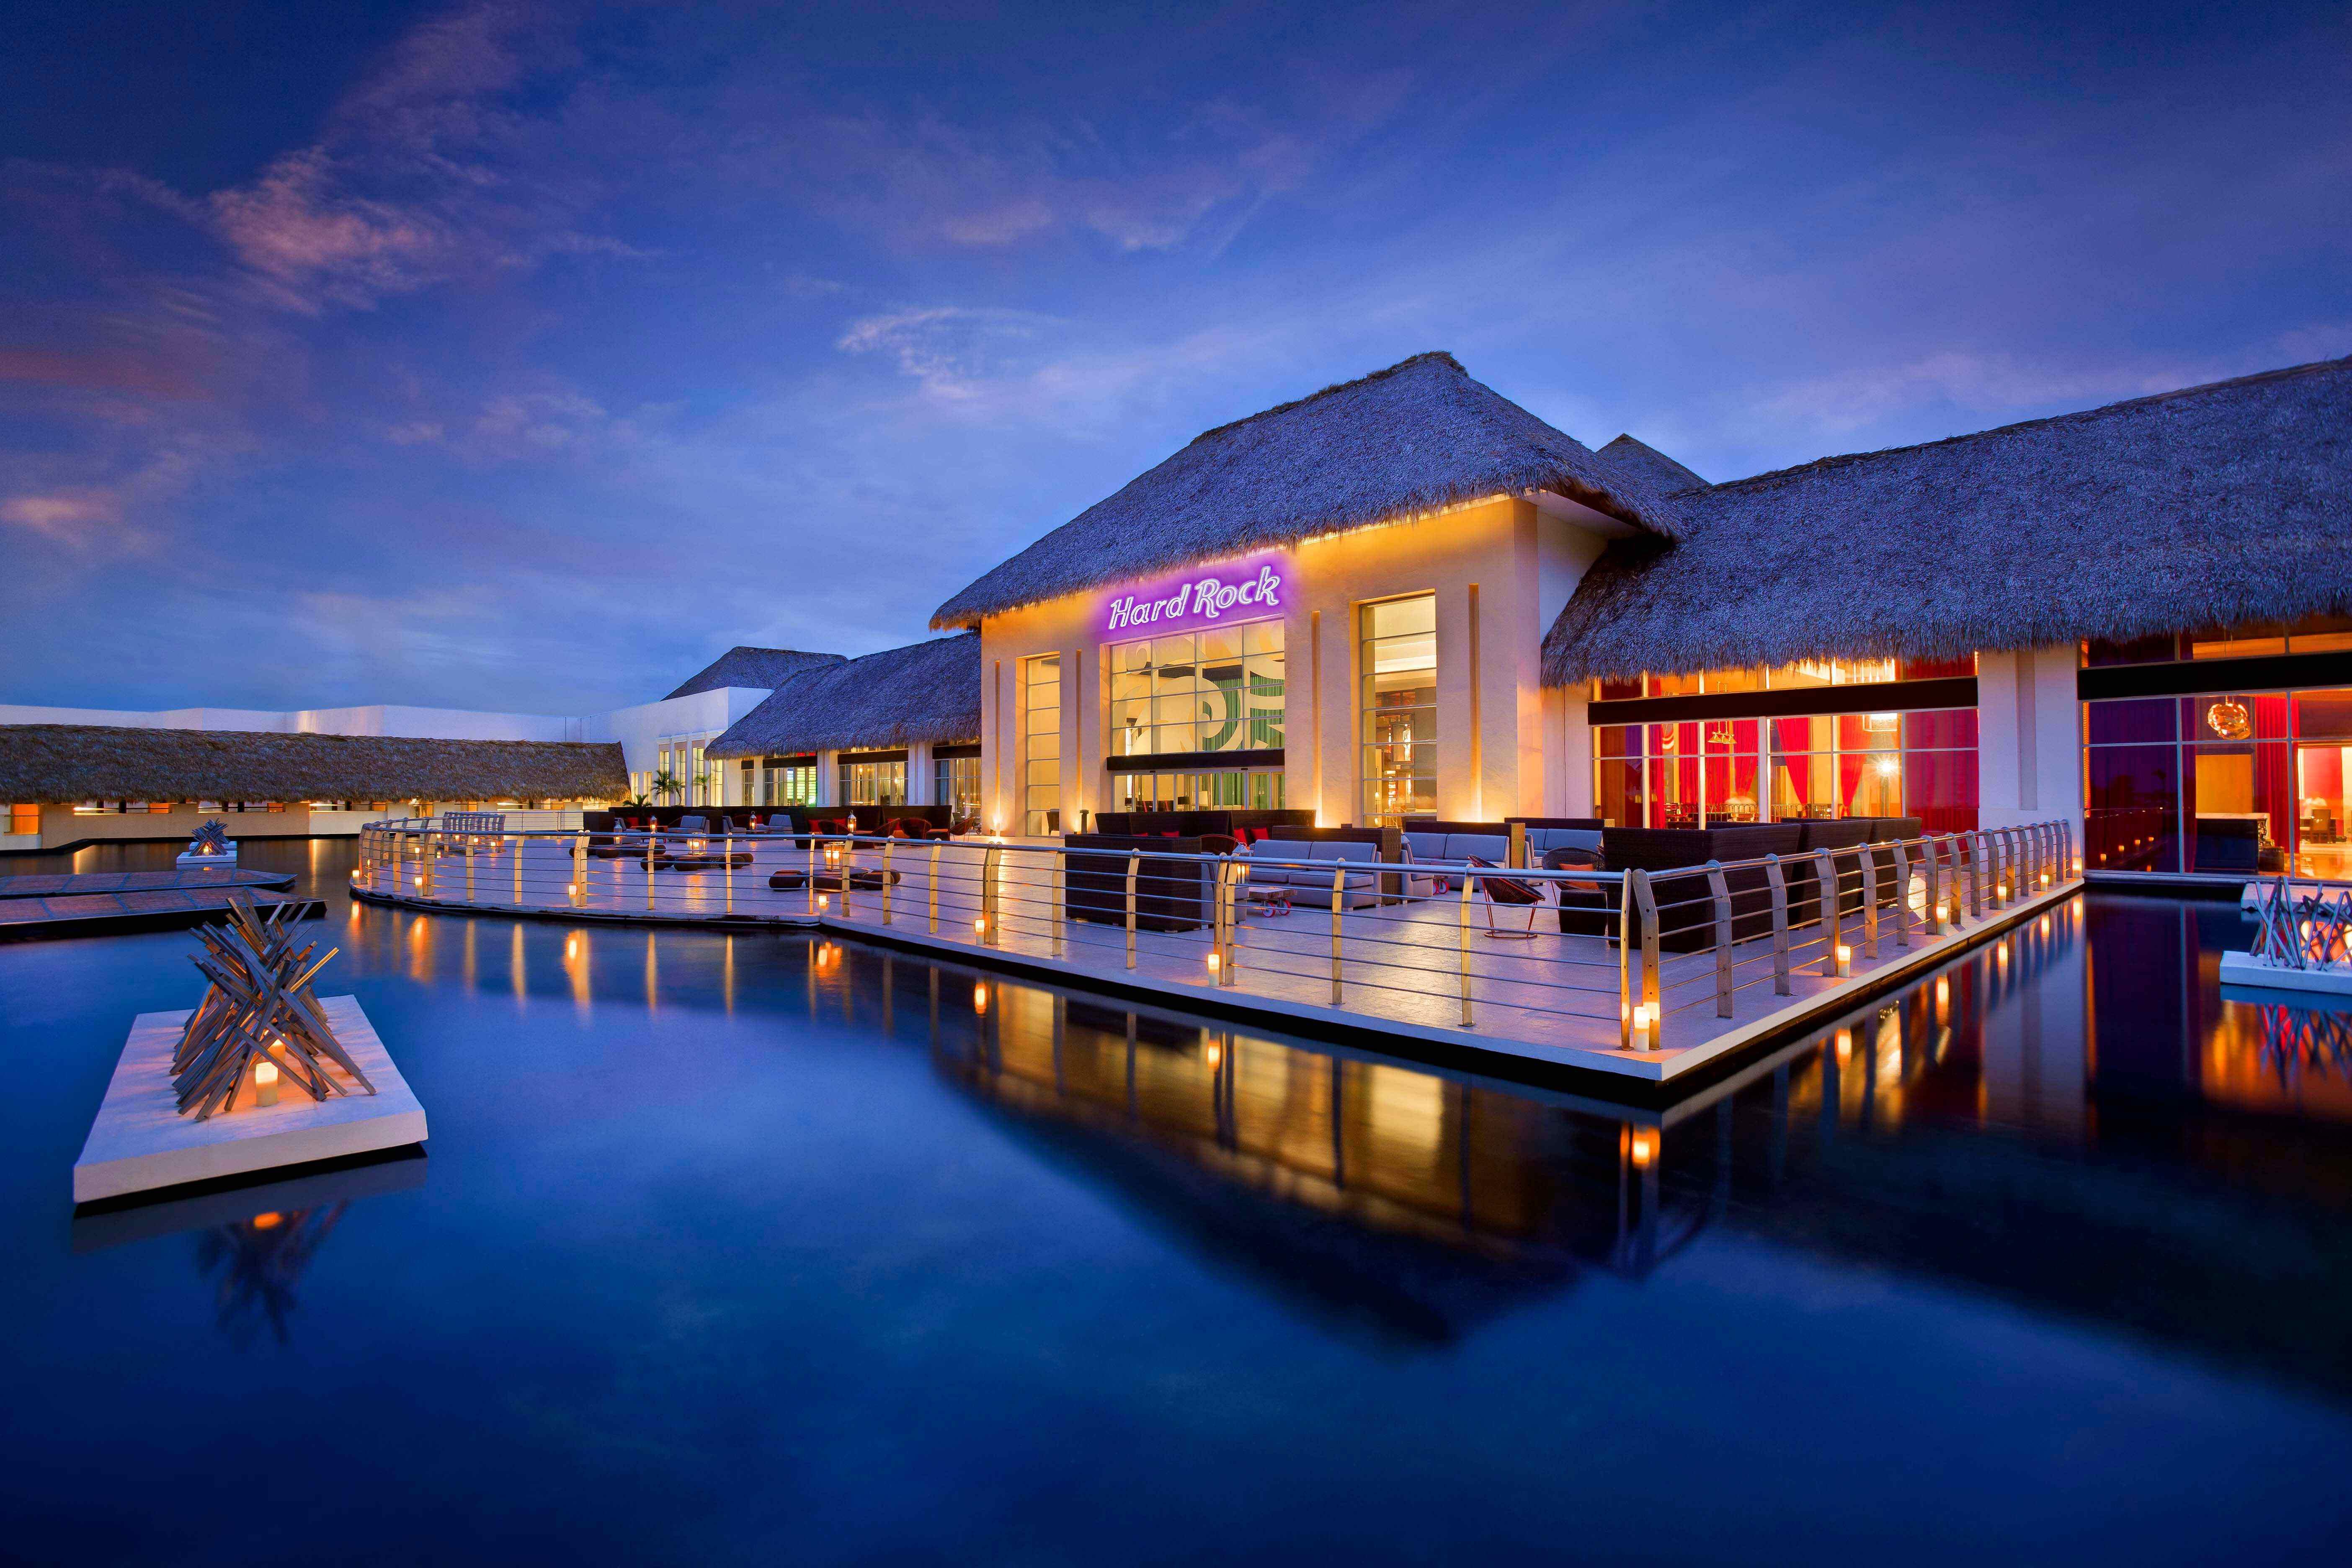 Hard Rock Cafe Punta Cana